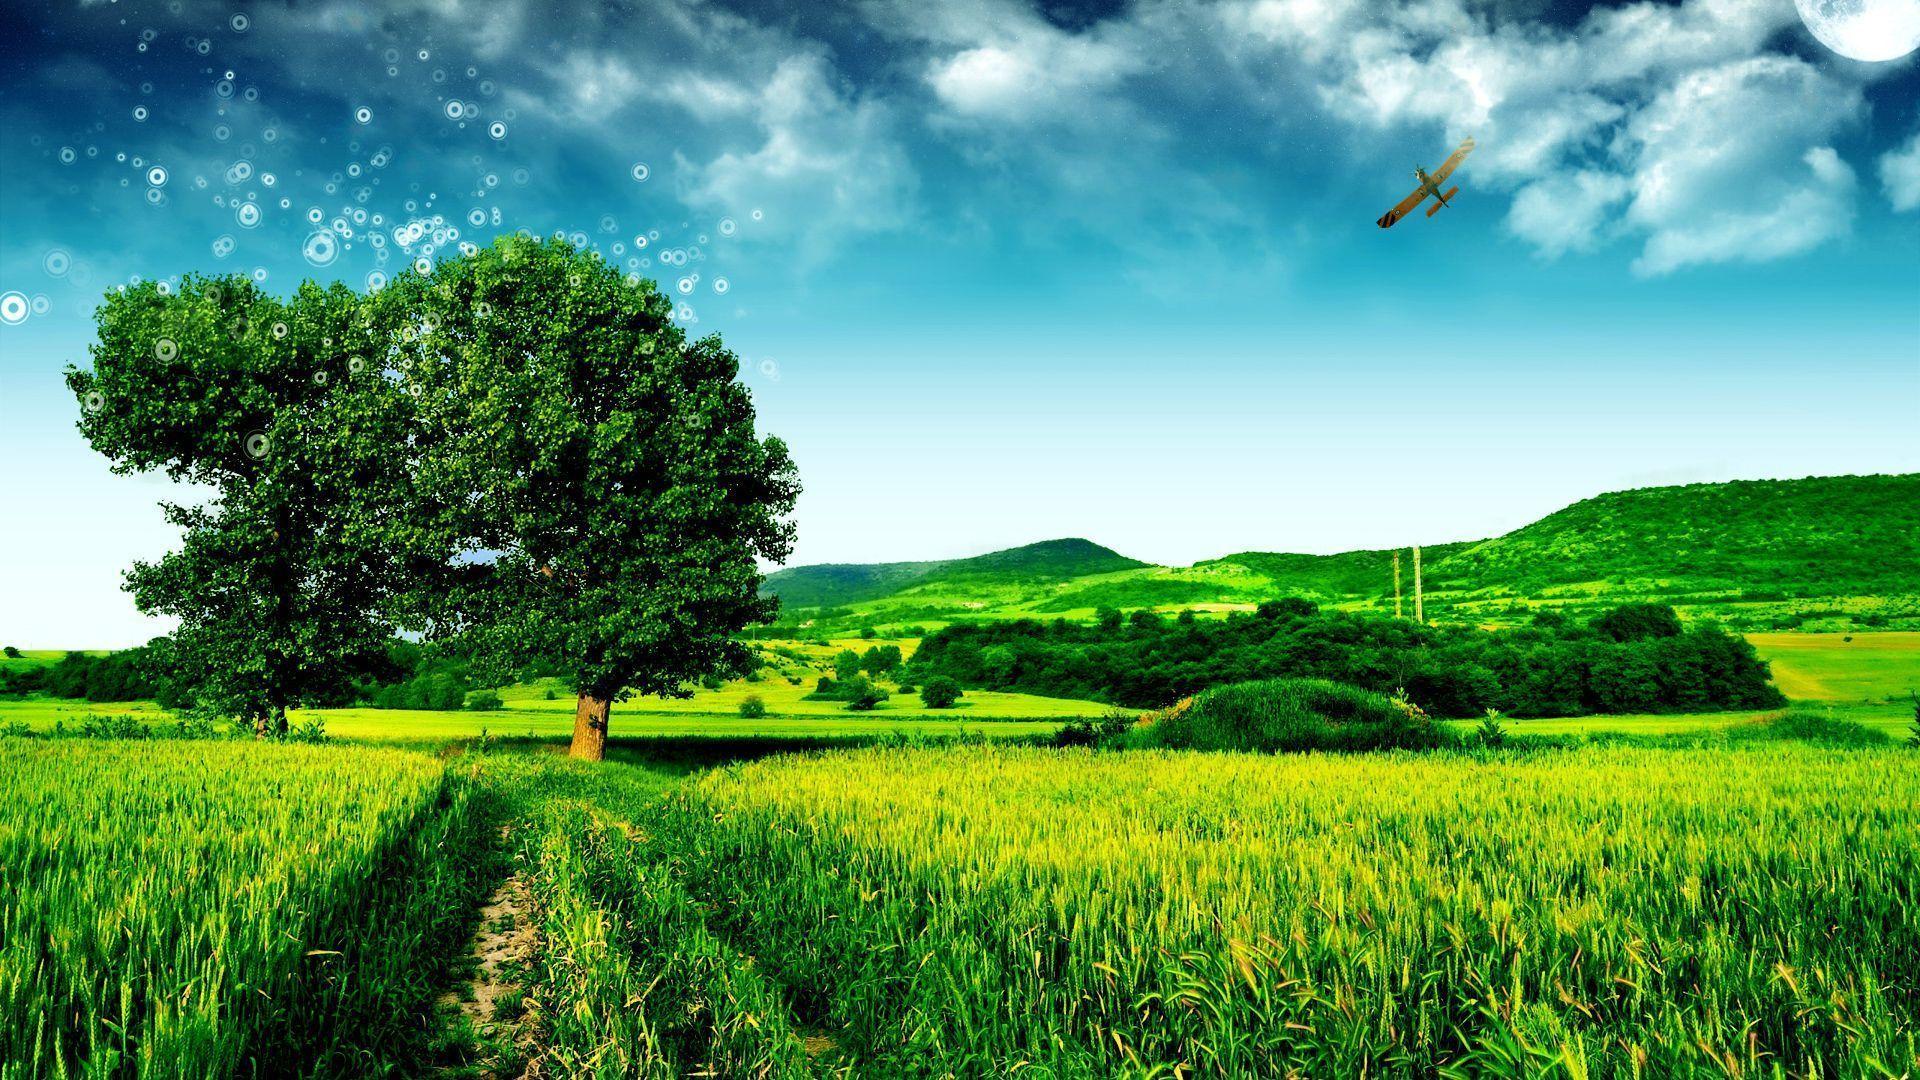 Cool Landscape Hd Wallpapers 1080p On Desktop Backgrounds With Landscape Hd Wallpapers 1080p Download Hd Wallpaper Di 2020 Hijau Rumah Hijau Rumput